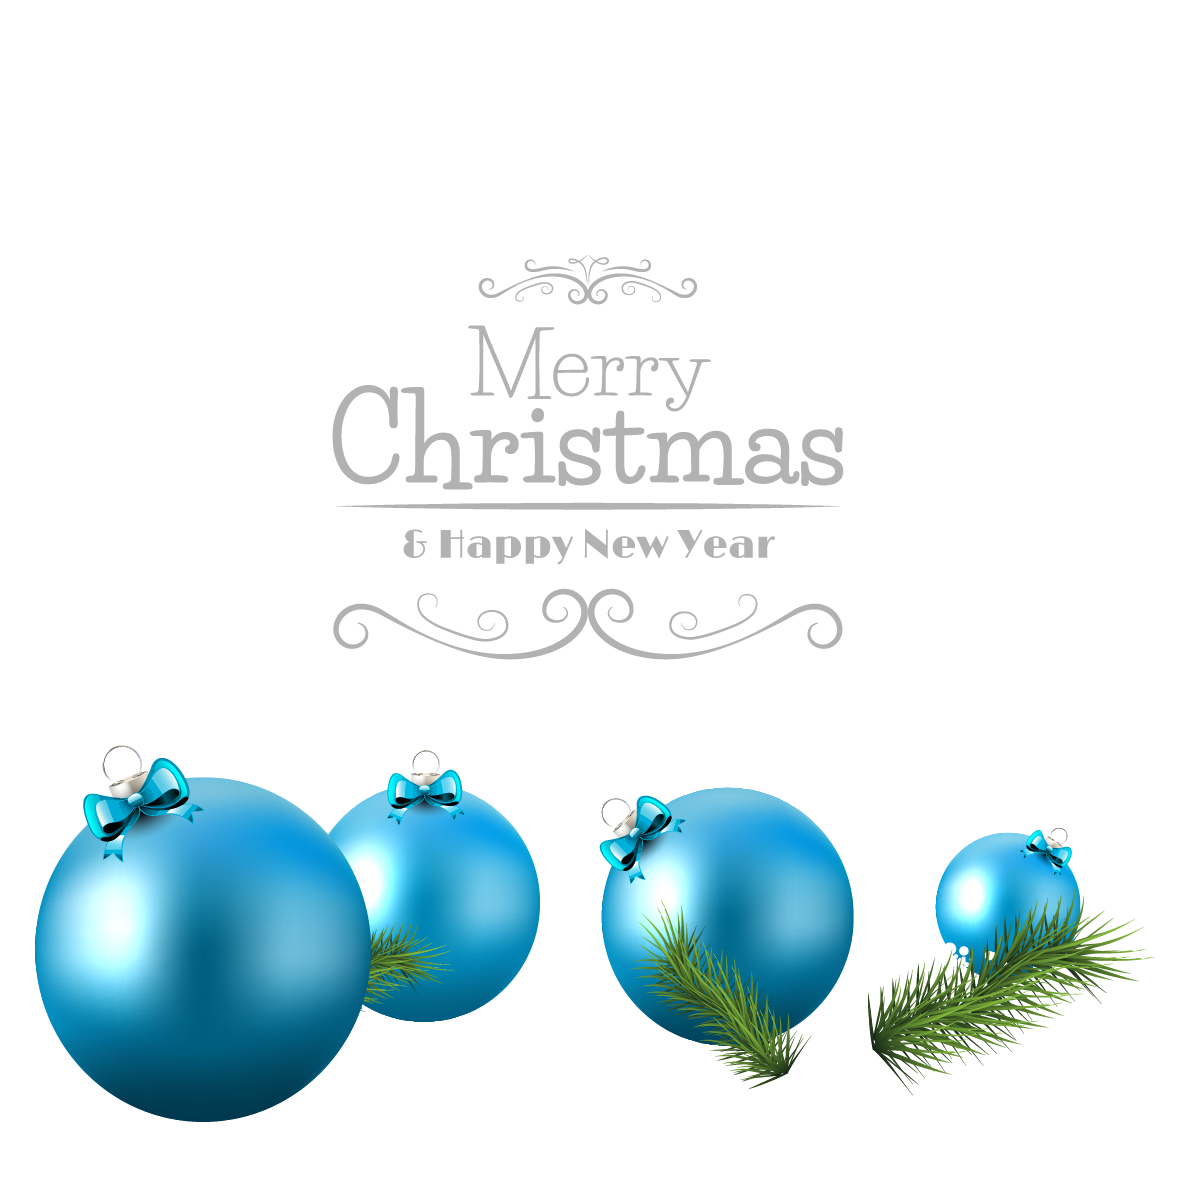 Christmas Santa Claus Desktop Wallpaper.